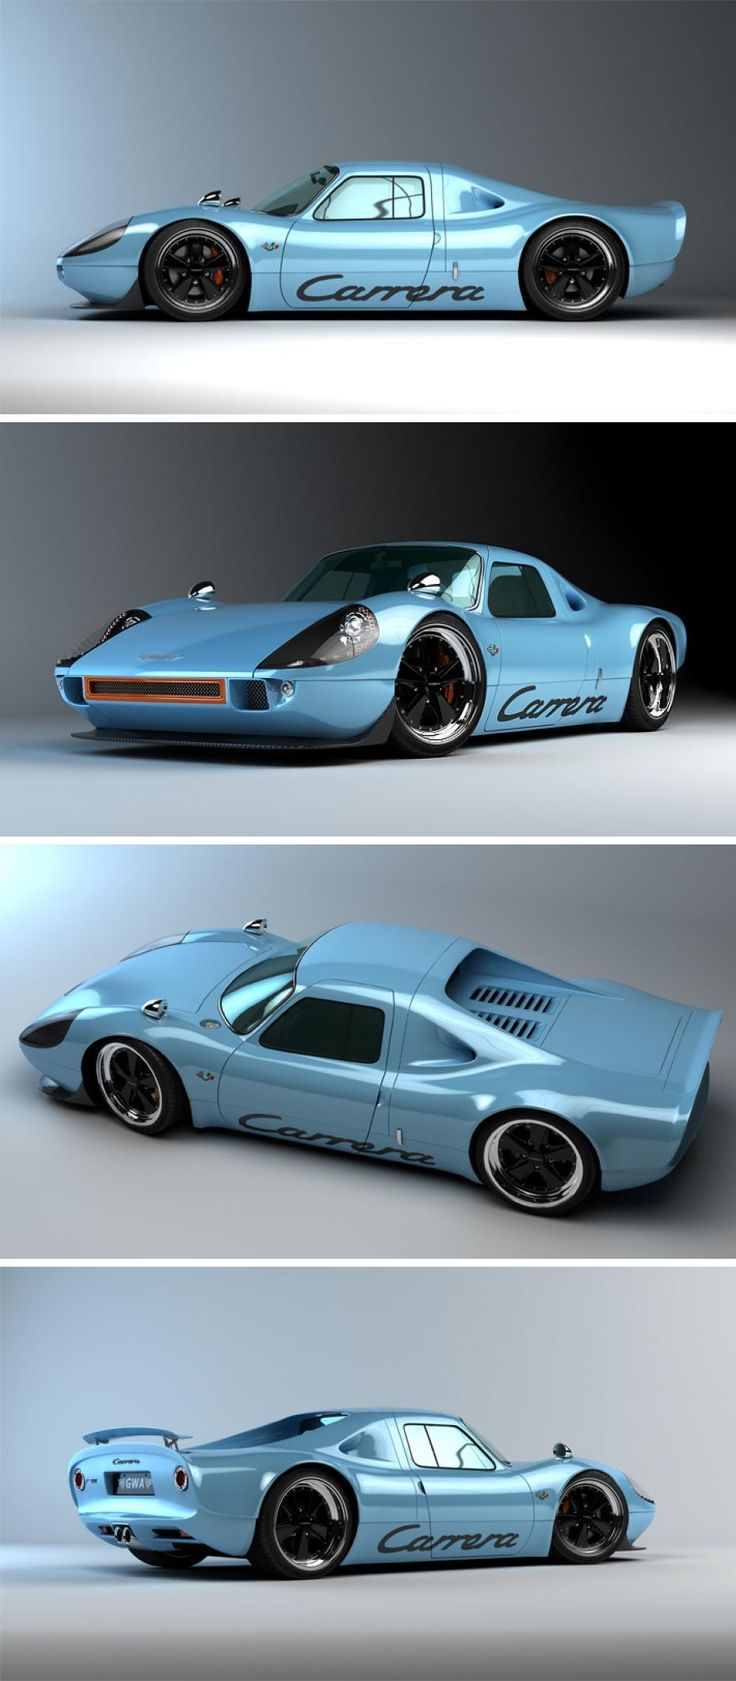 Porsche P 904 Carrera Texas Tuner Gullwing America Used The